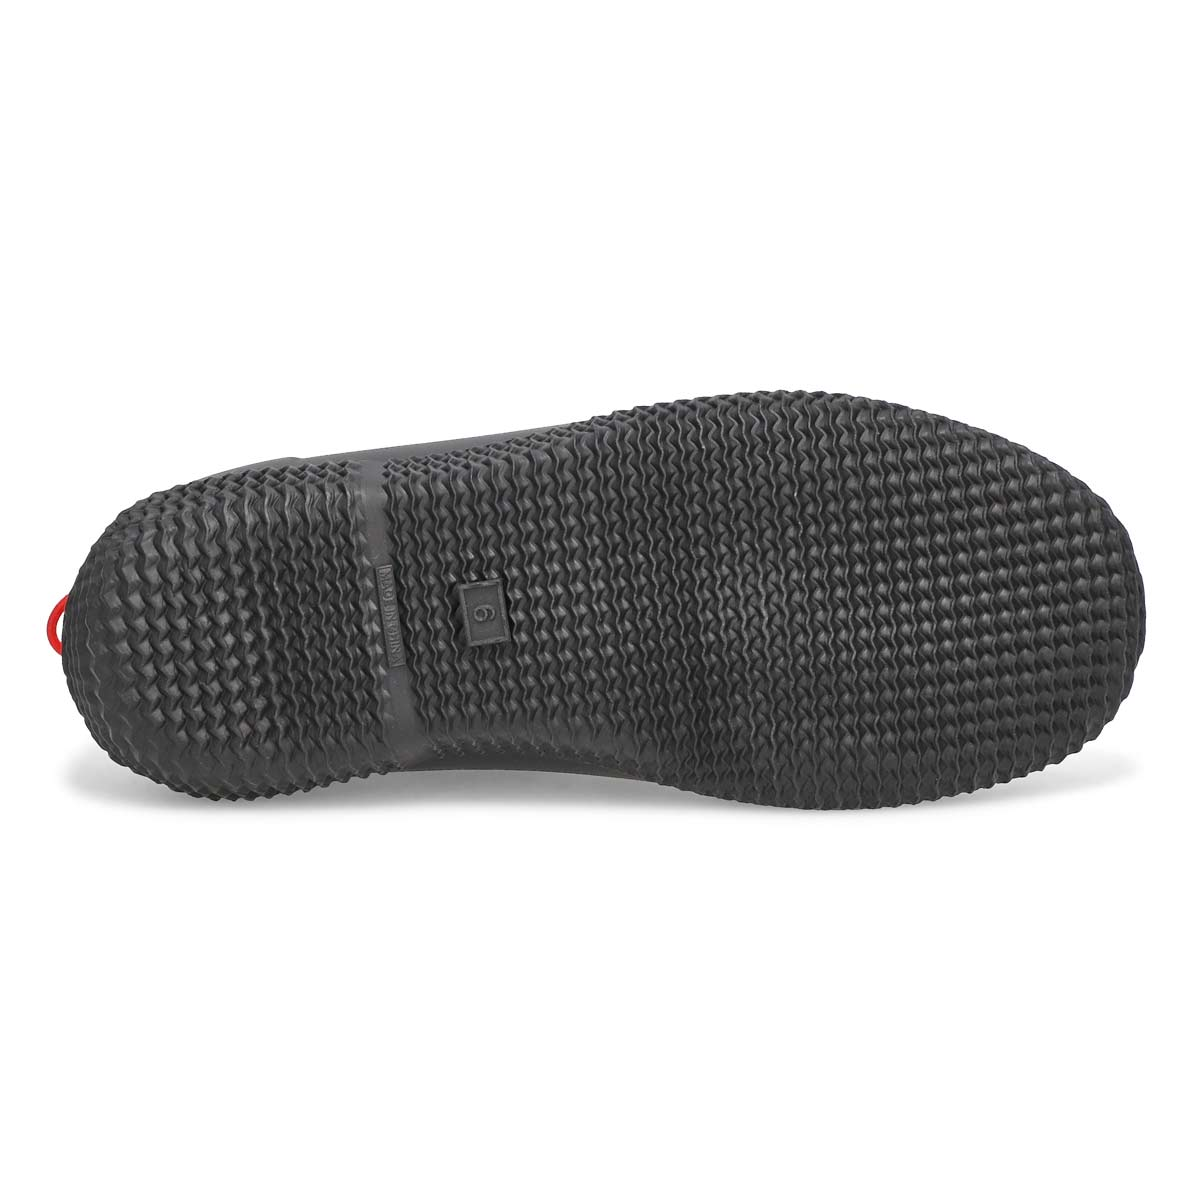 Women's Original Sherpa Waterproof Shoe - Black